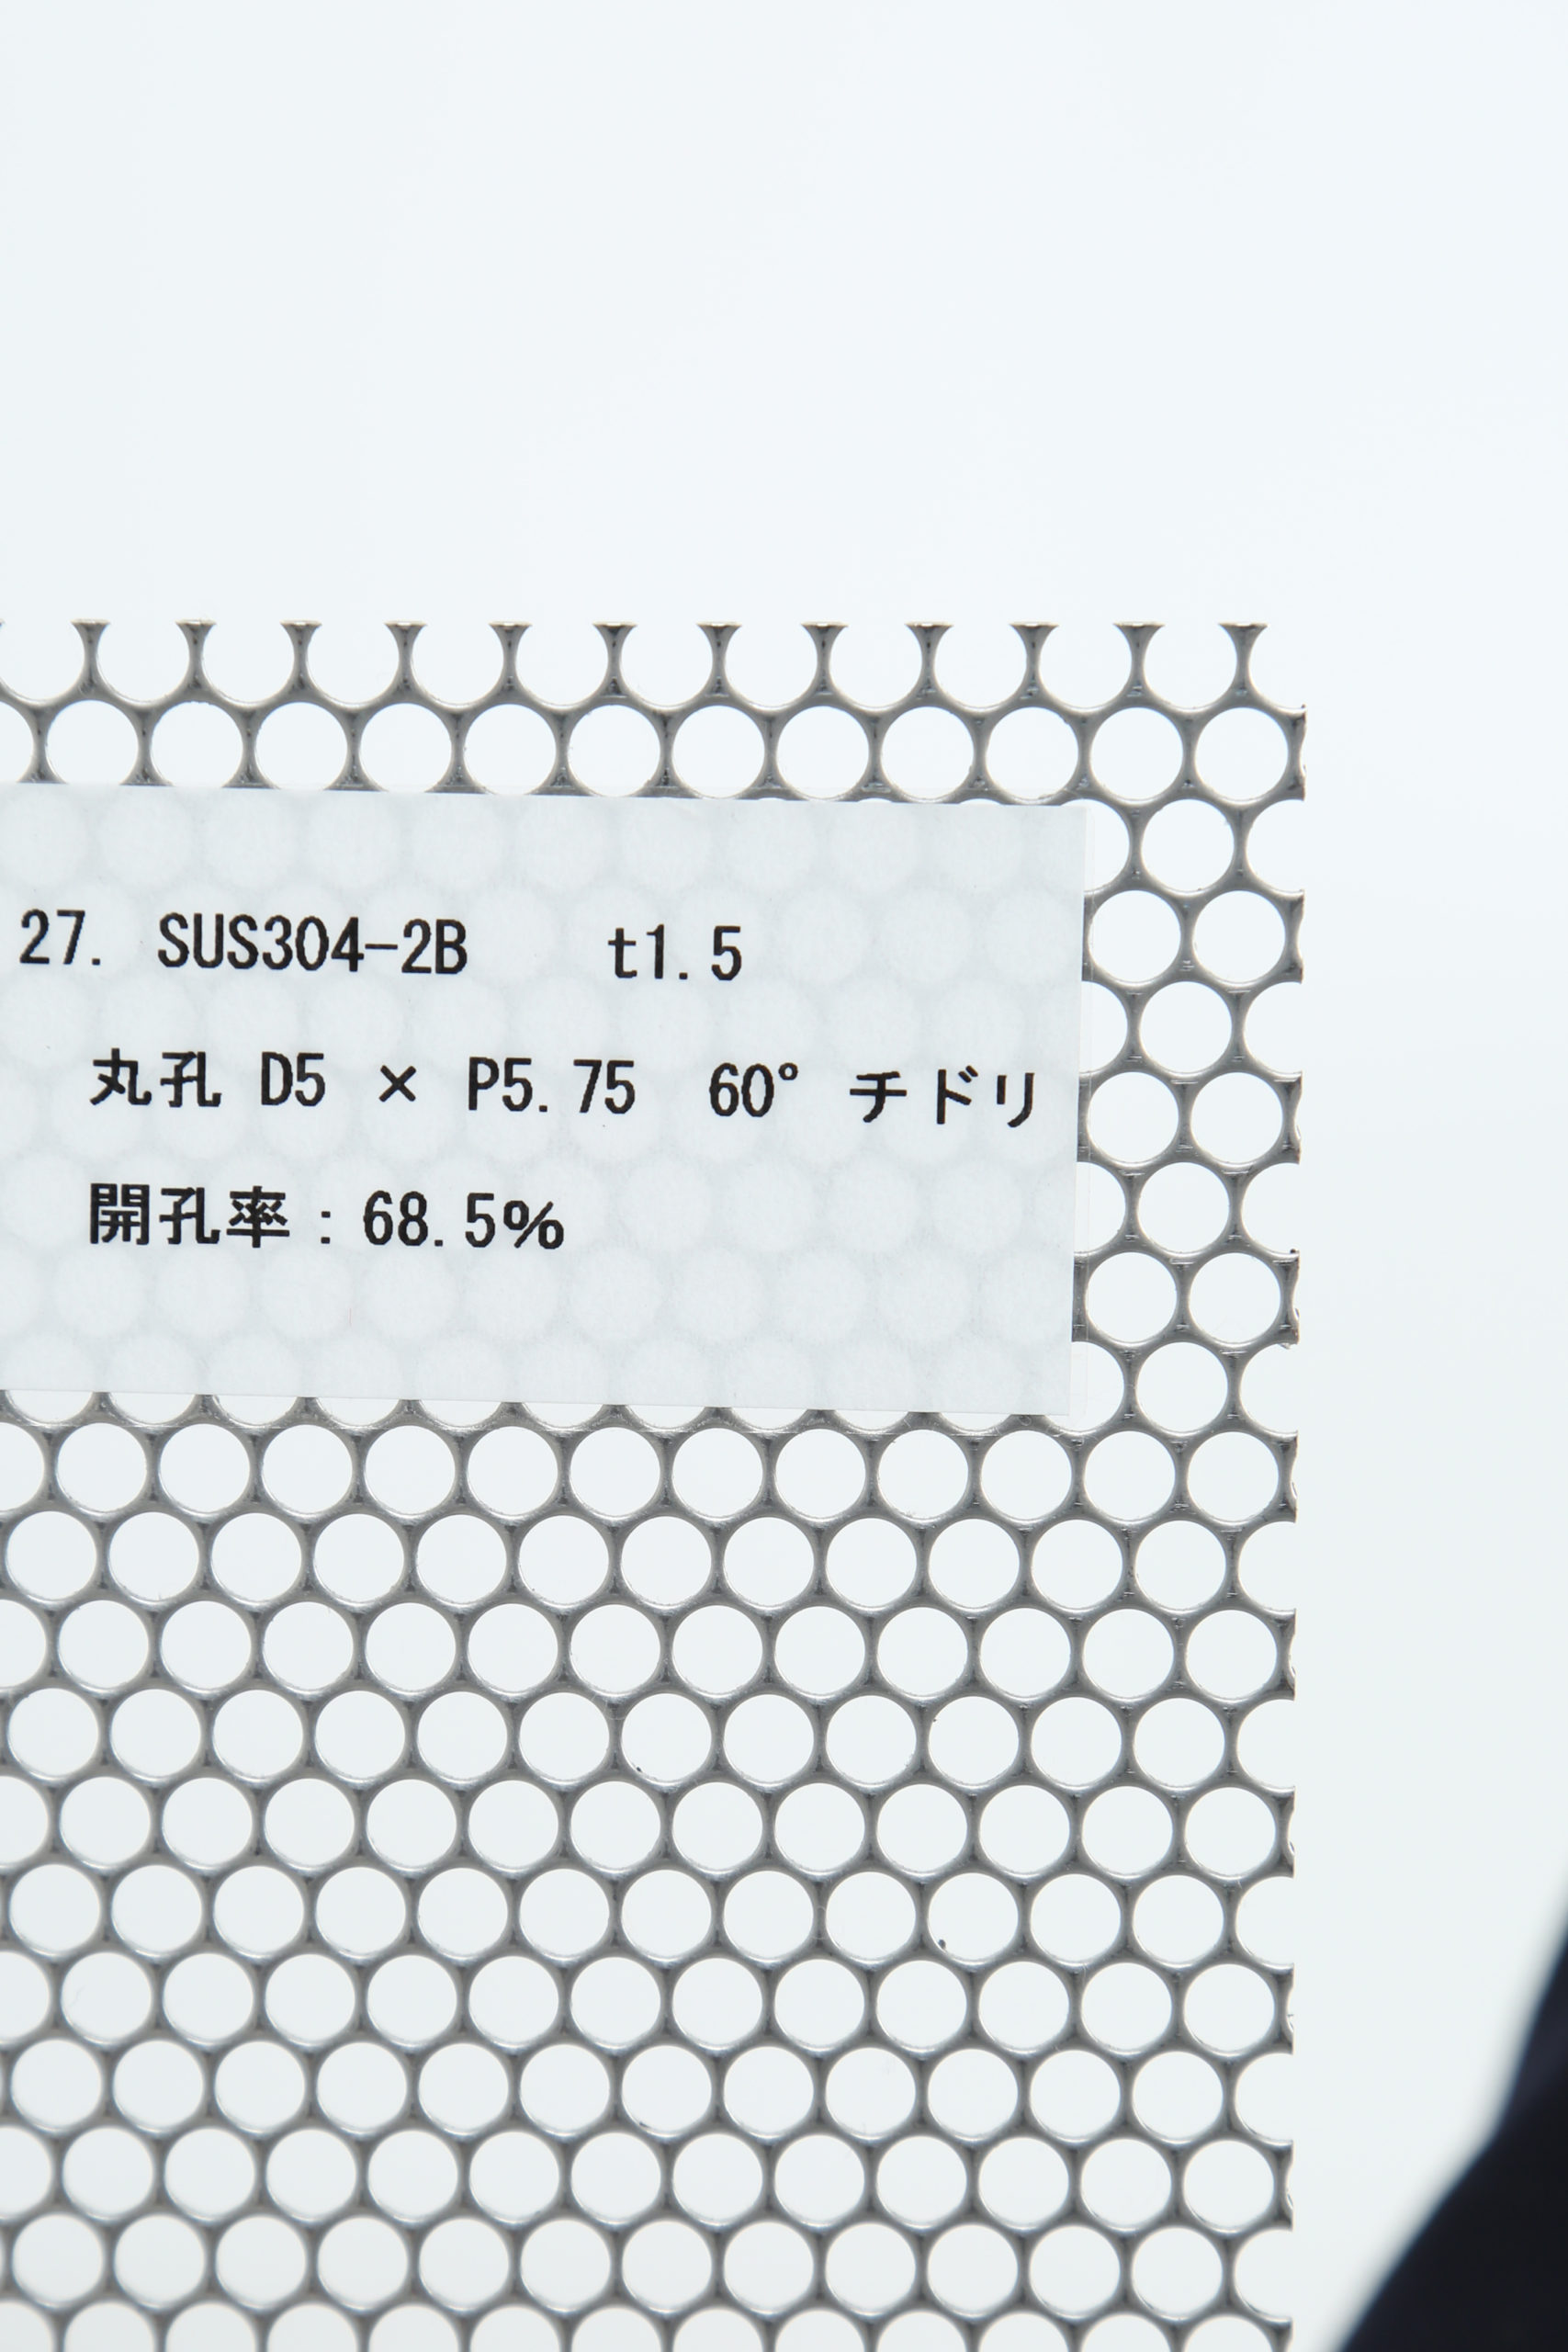 SUS 304-2B t1.5 丸孔 D5×P5.75 60°チドリ 開口率:68.5%